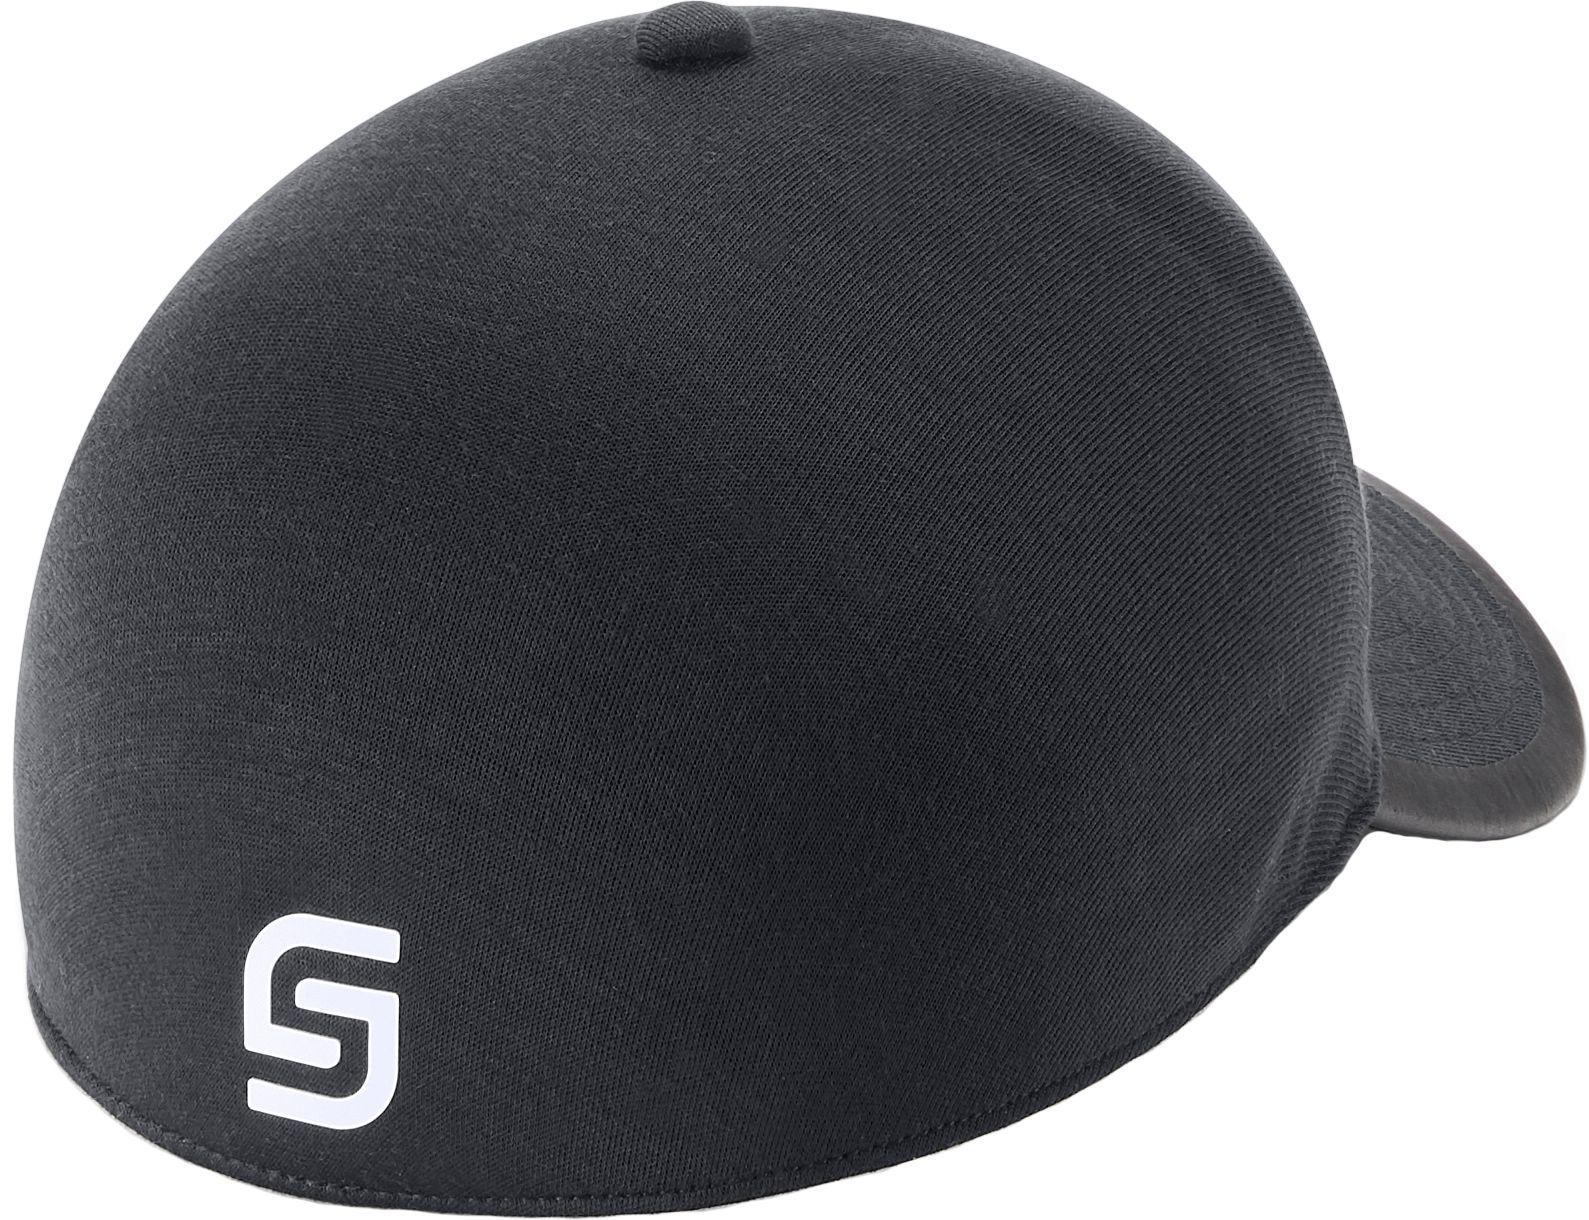 2448cb4d653 Under Armour - Black Jordan Spieth Official Elevated Tour Golf Hat for Men  - Lyst. View fullscreen